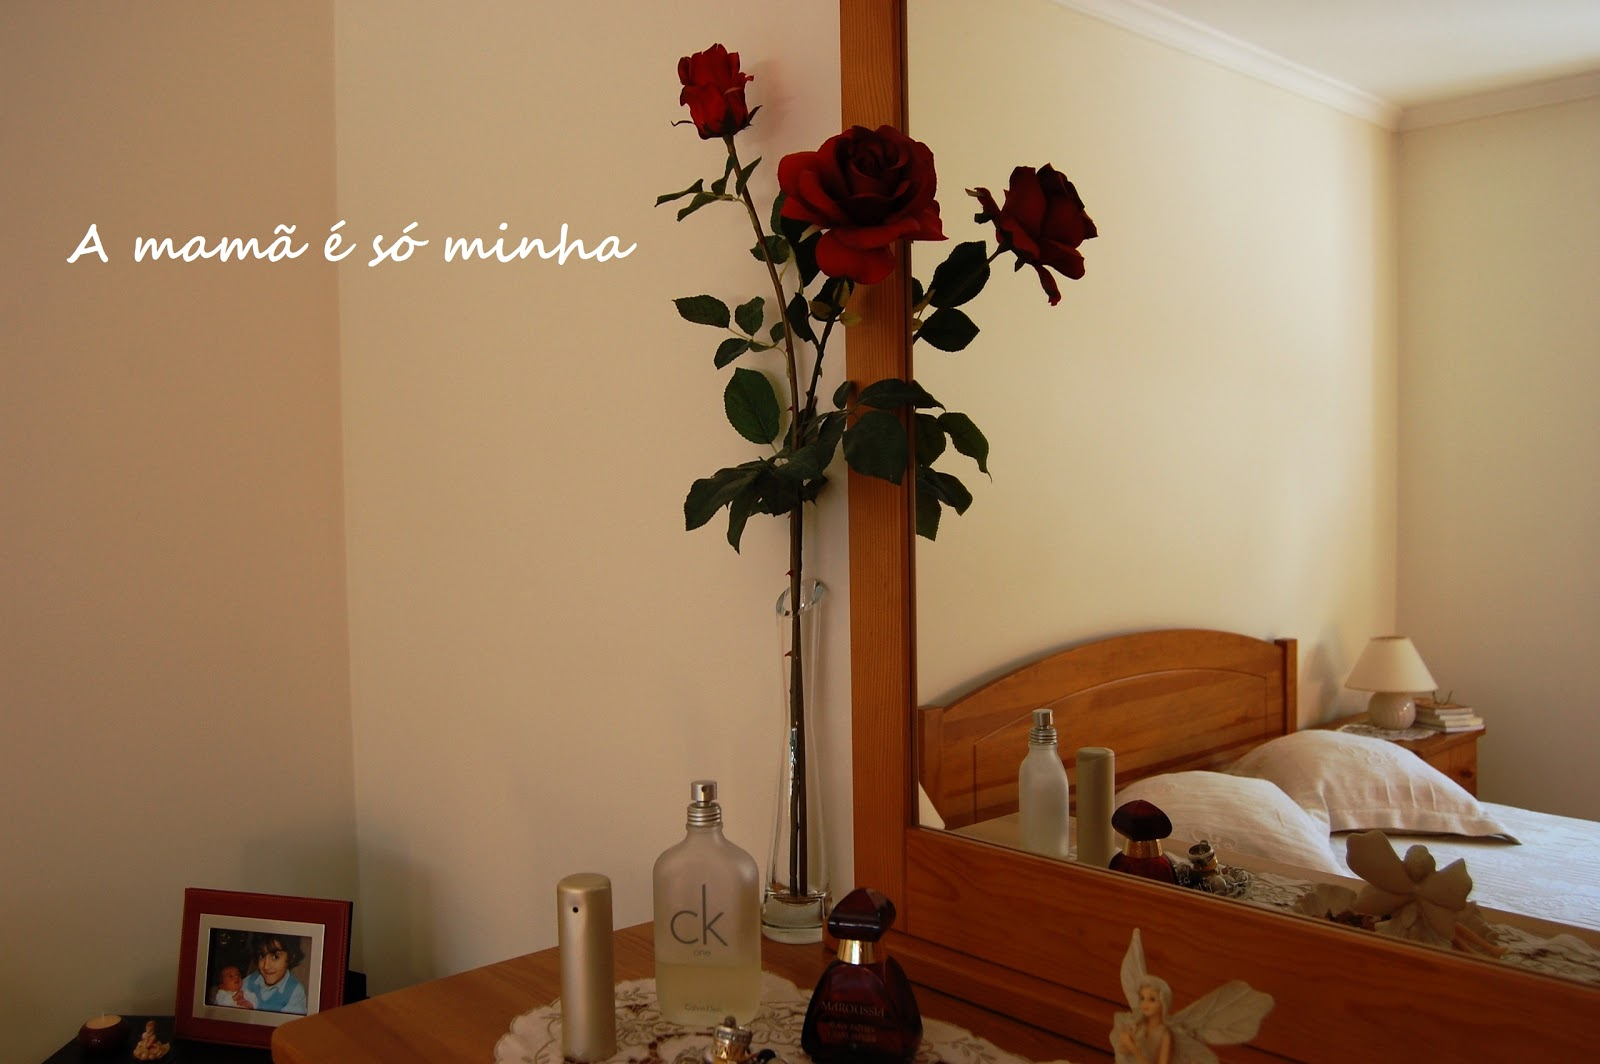 #341608 mamã é só minha: Day # 11 Where you sleep 478 Janelas Duplas Orçamento